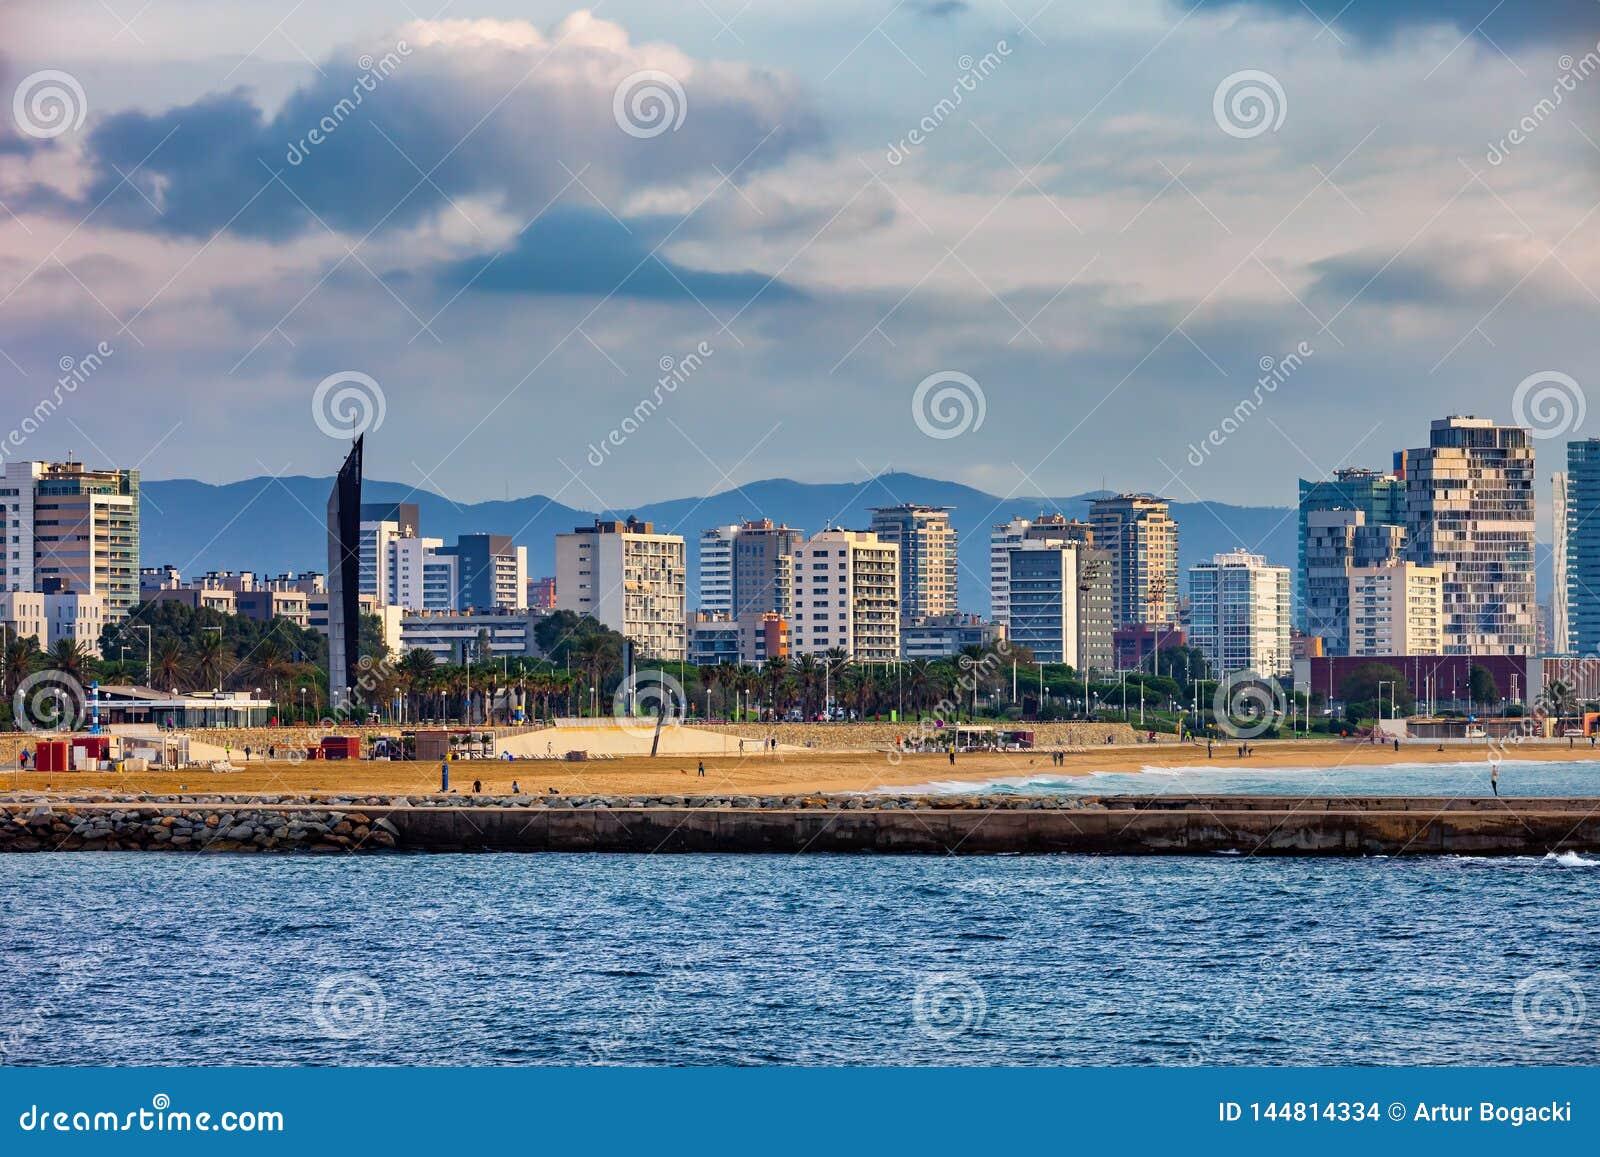 Barcelona Sea View Skyline